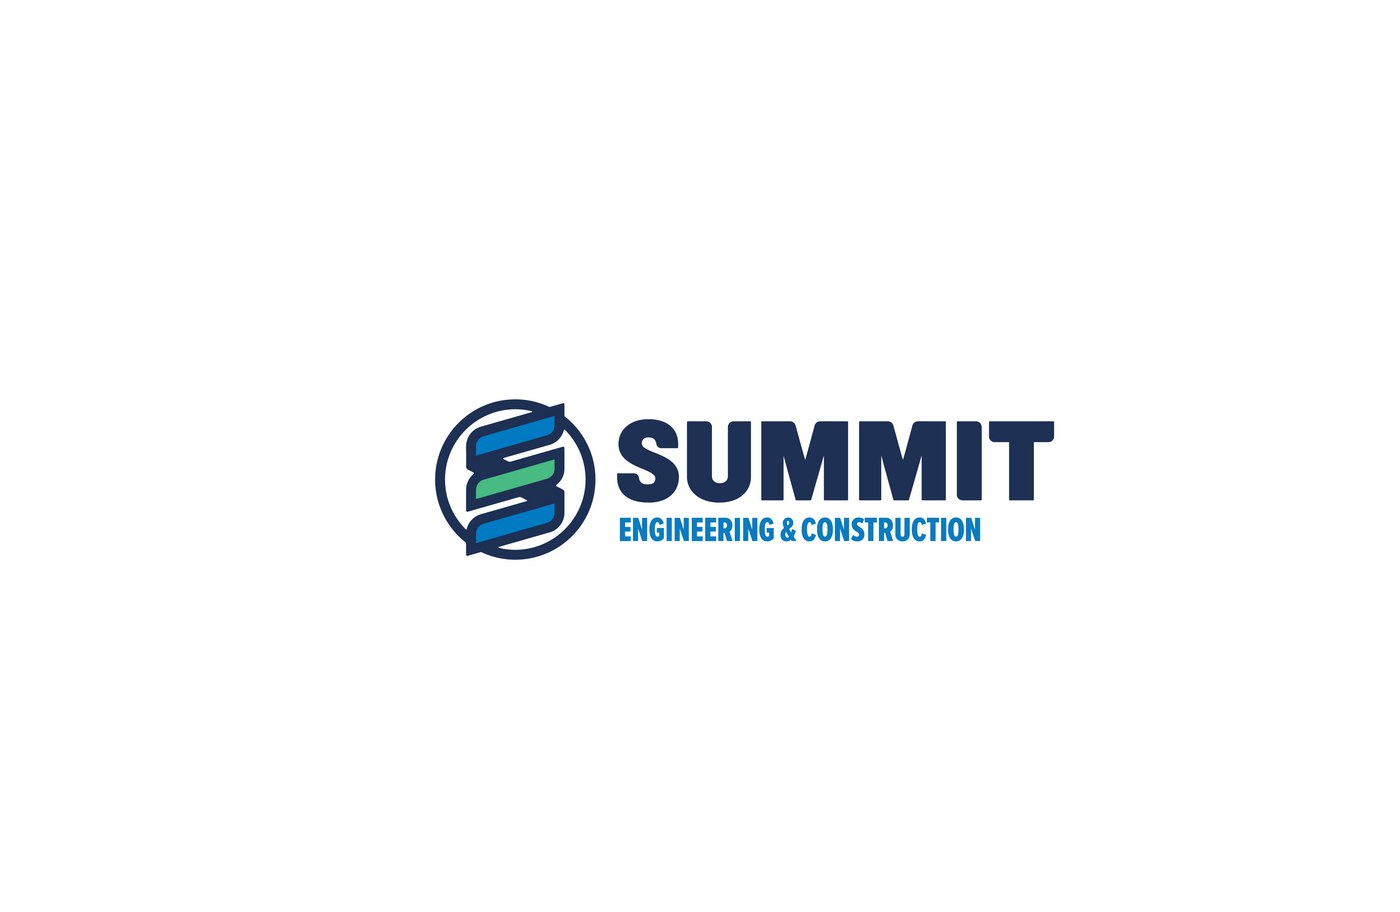 Summit_About Us_Summit Engineering & Construction-01